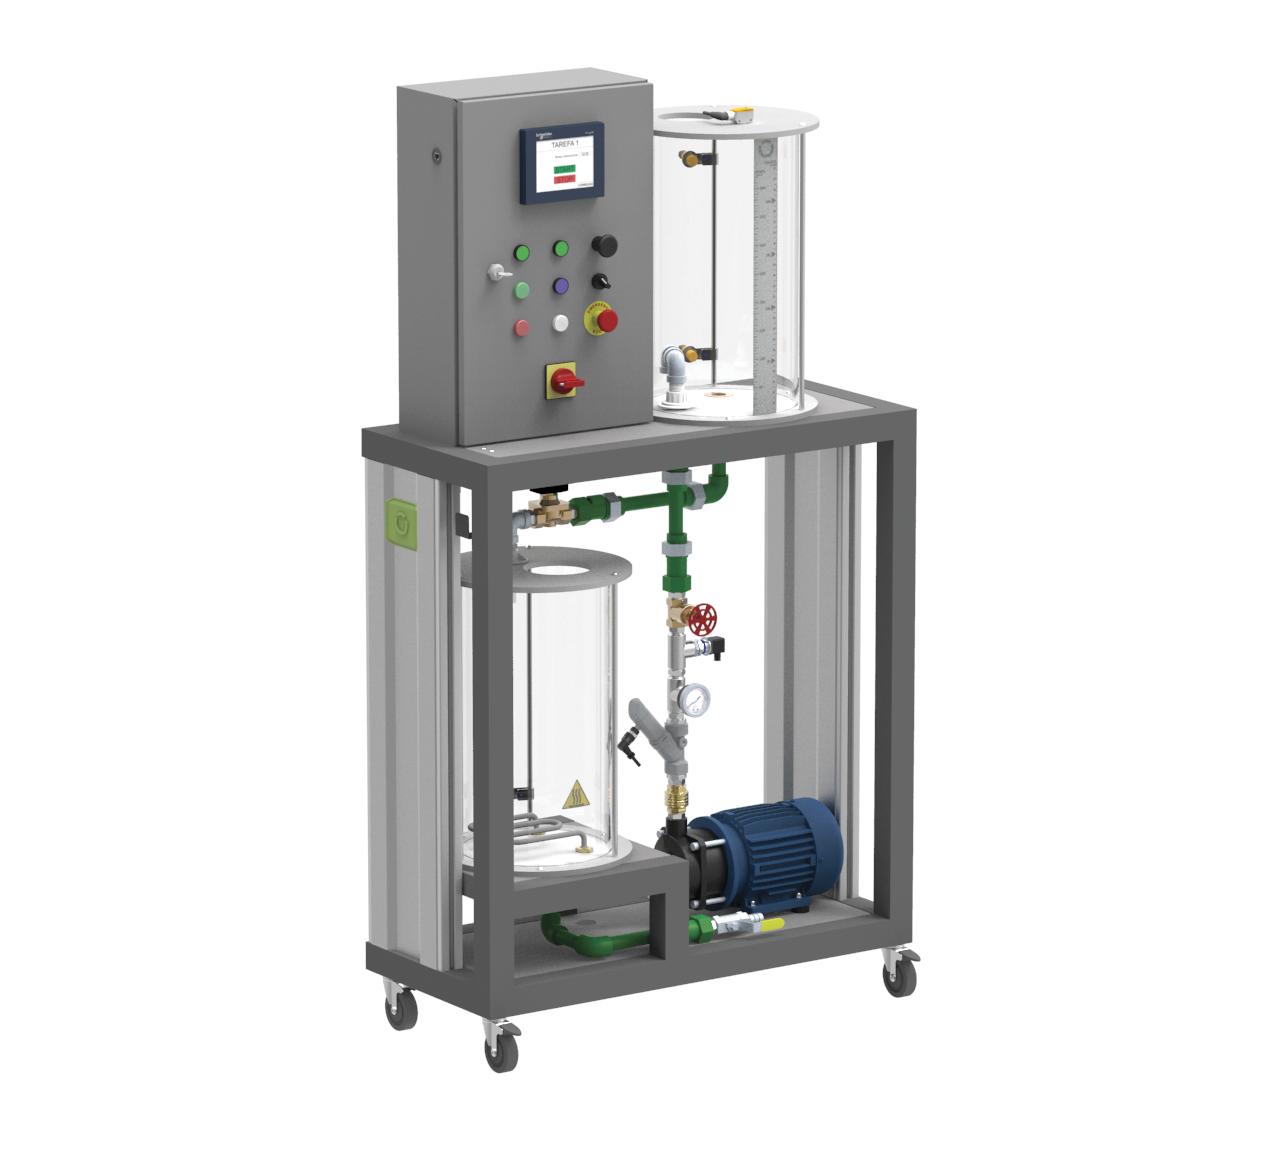 lab-automacao-bancada-didatica-planta-de-controle-de-nivel-e-temperatura-auttom-5